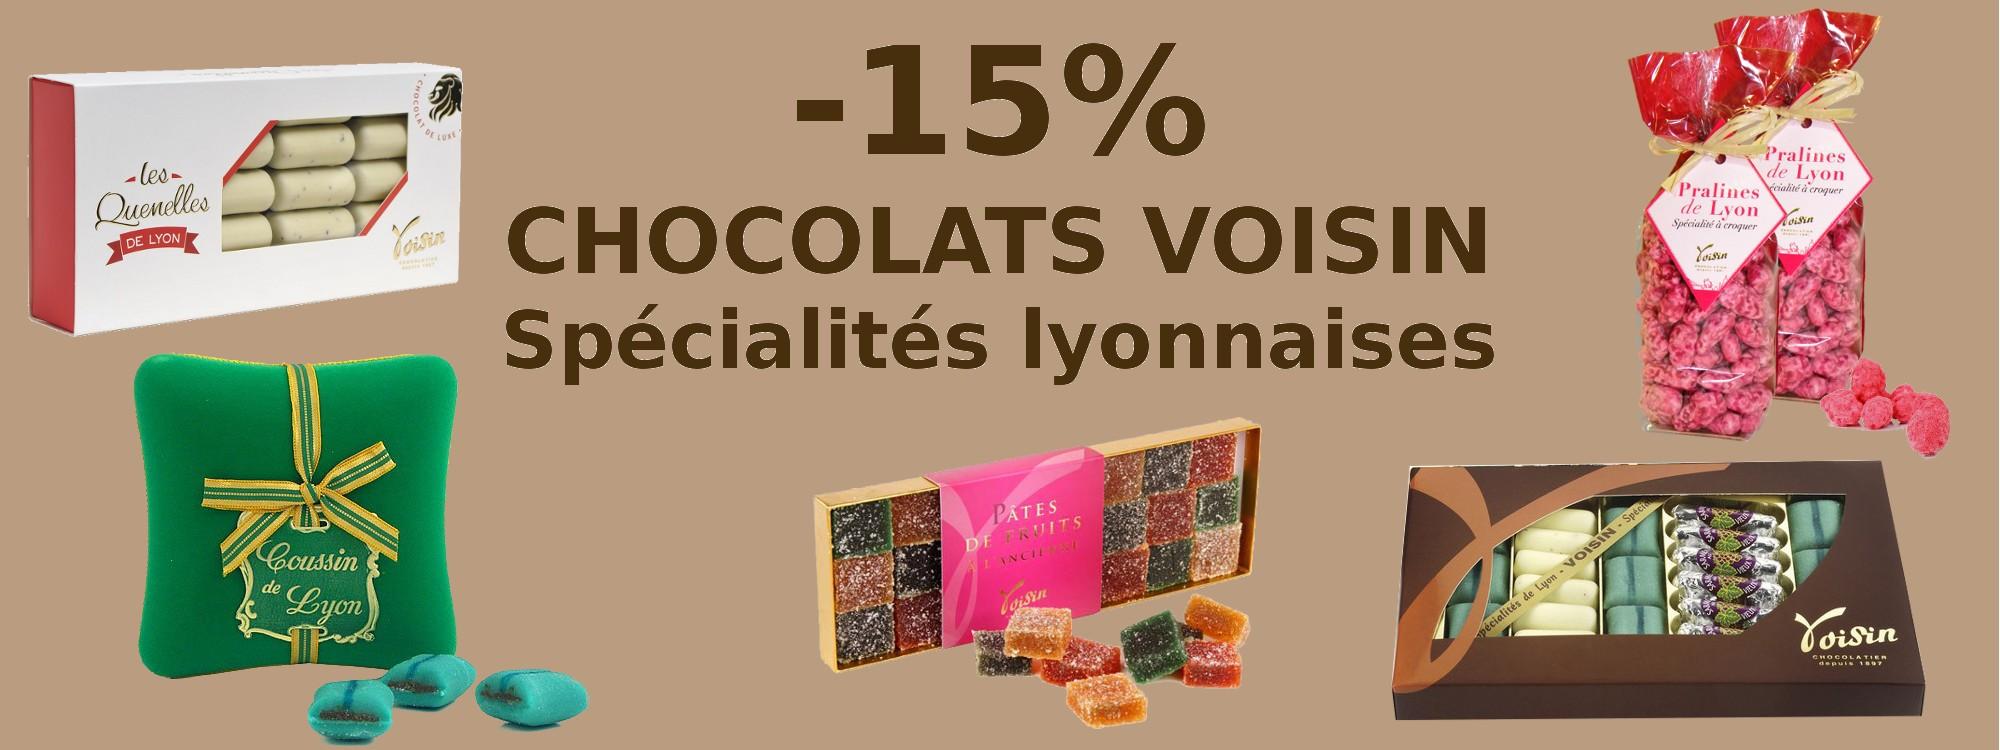 Chocolat Voisin